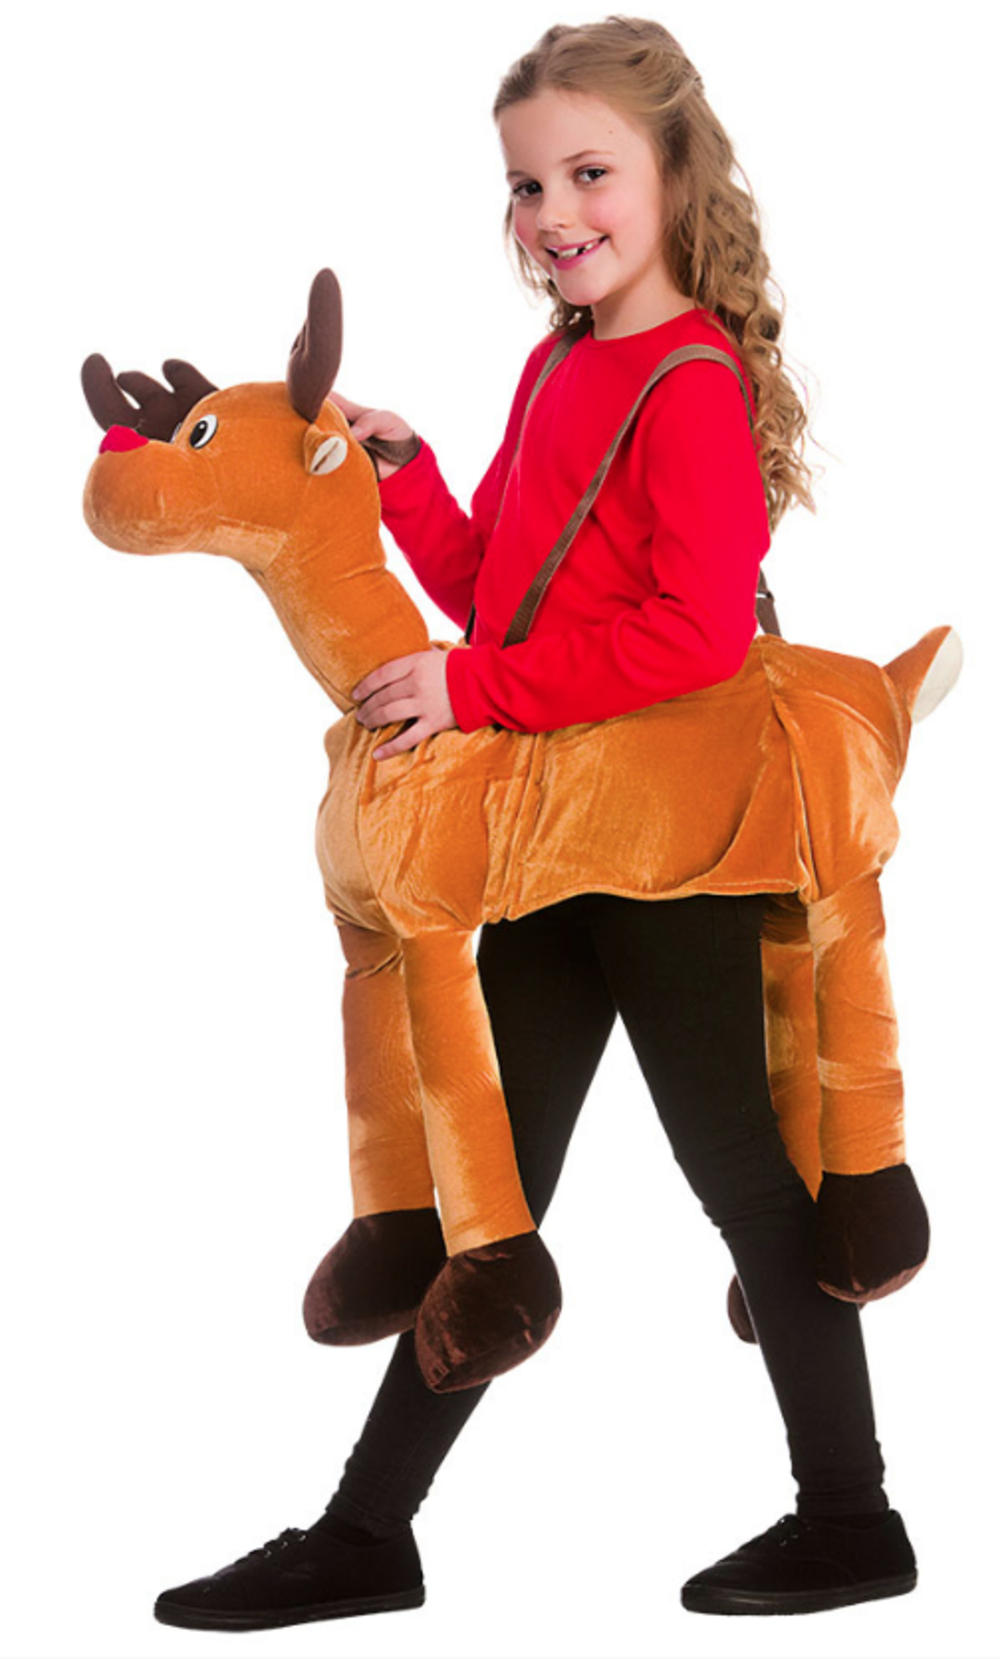 Kids Ride On Reindeer Costume